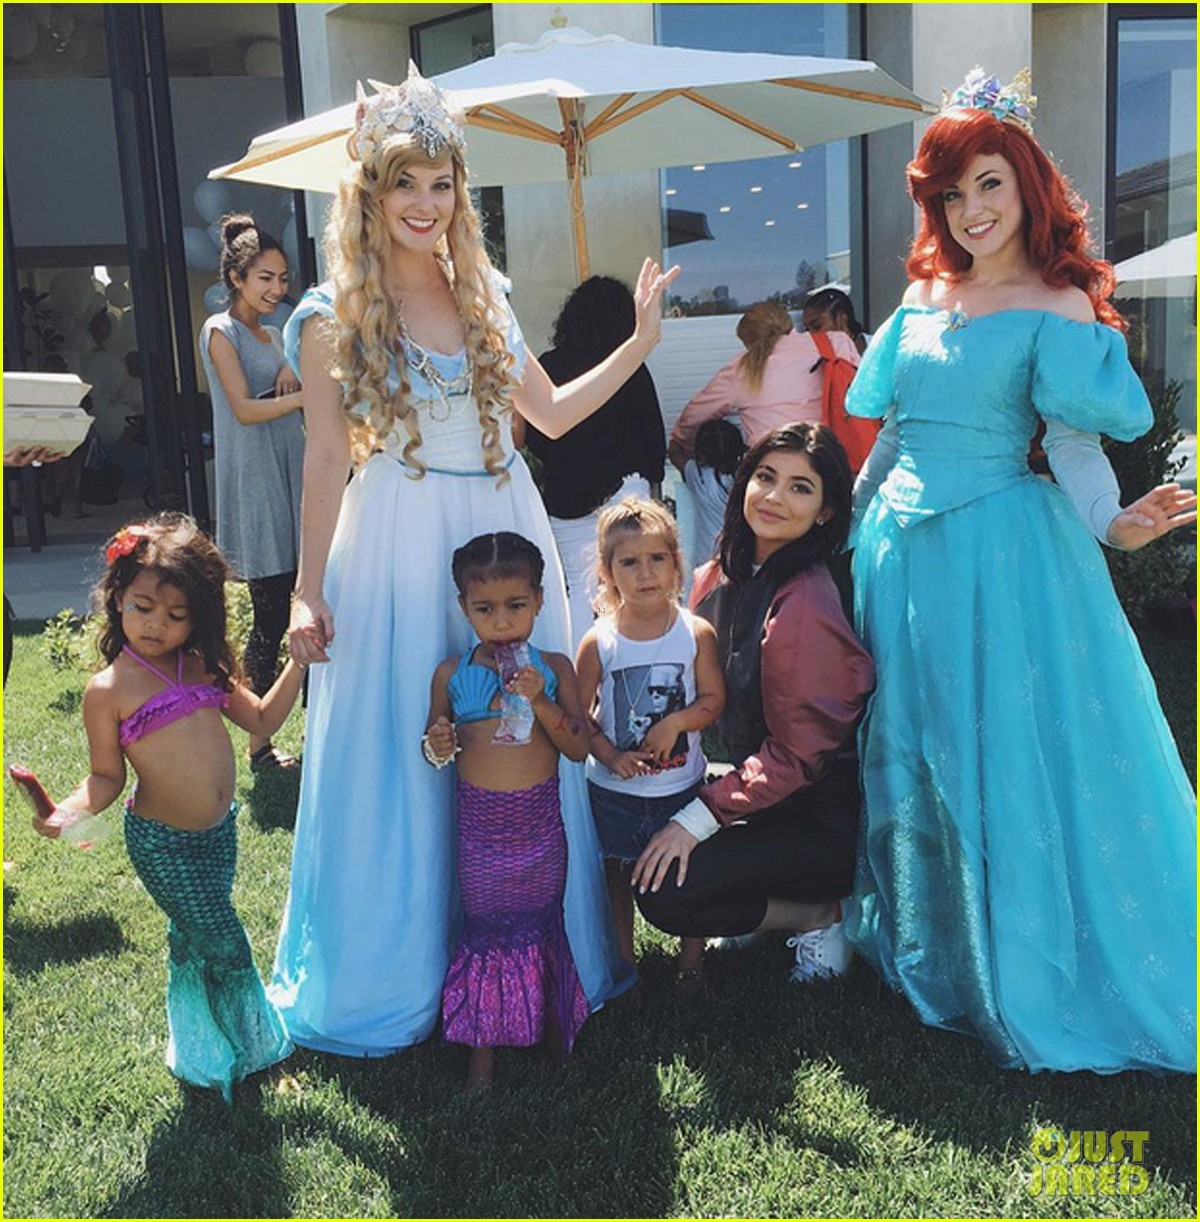 kids celebrations-venuerific-blog-birthday-disney-princesses-kardashian